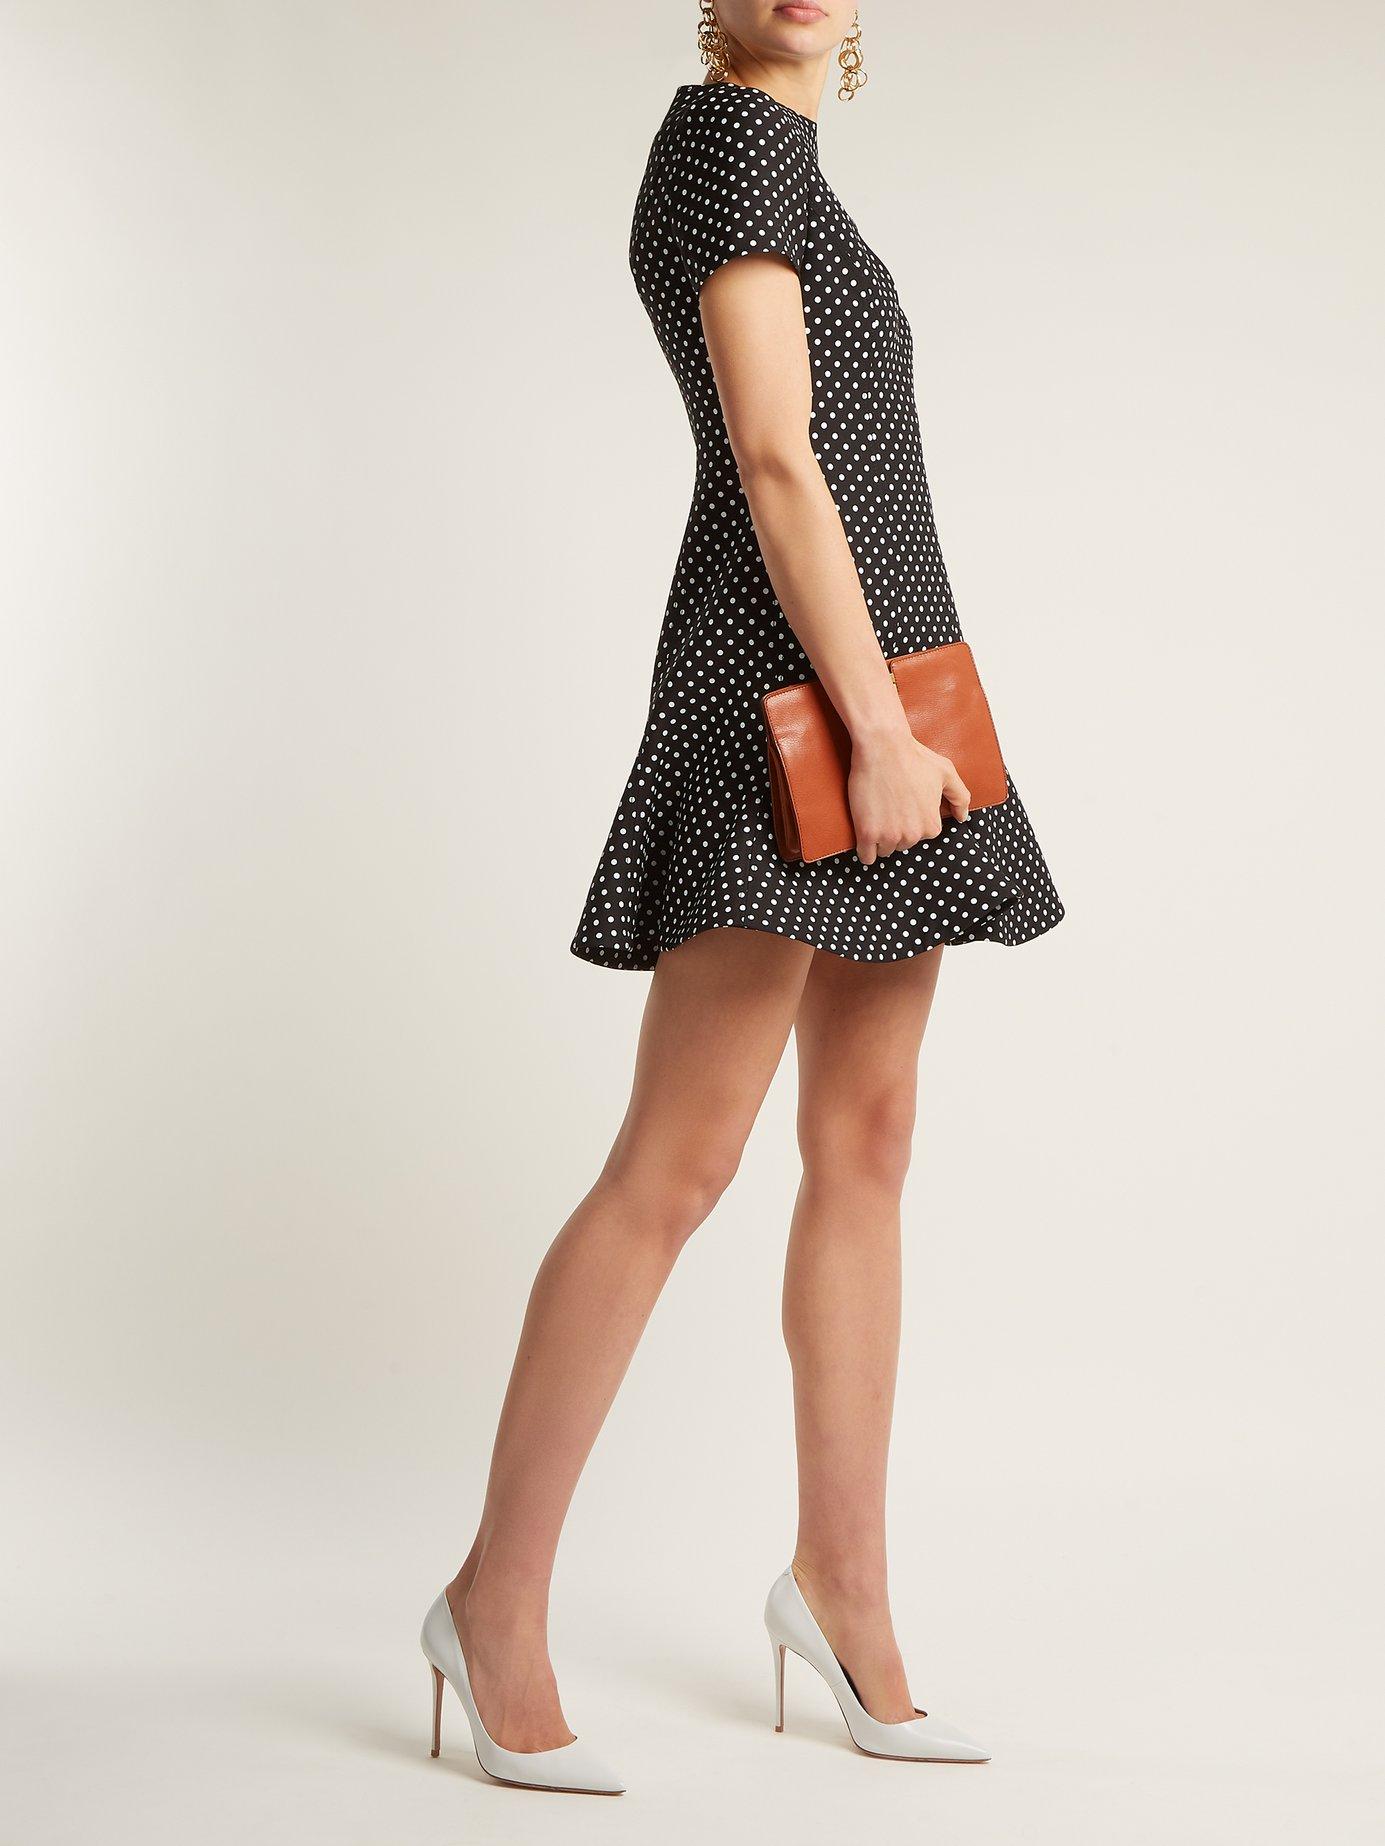 Polka-dot wool-blend dress by Valentino